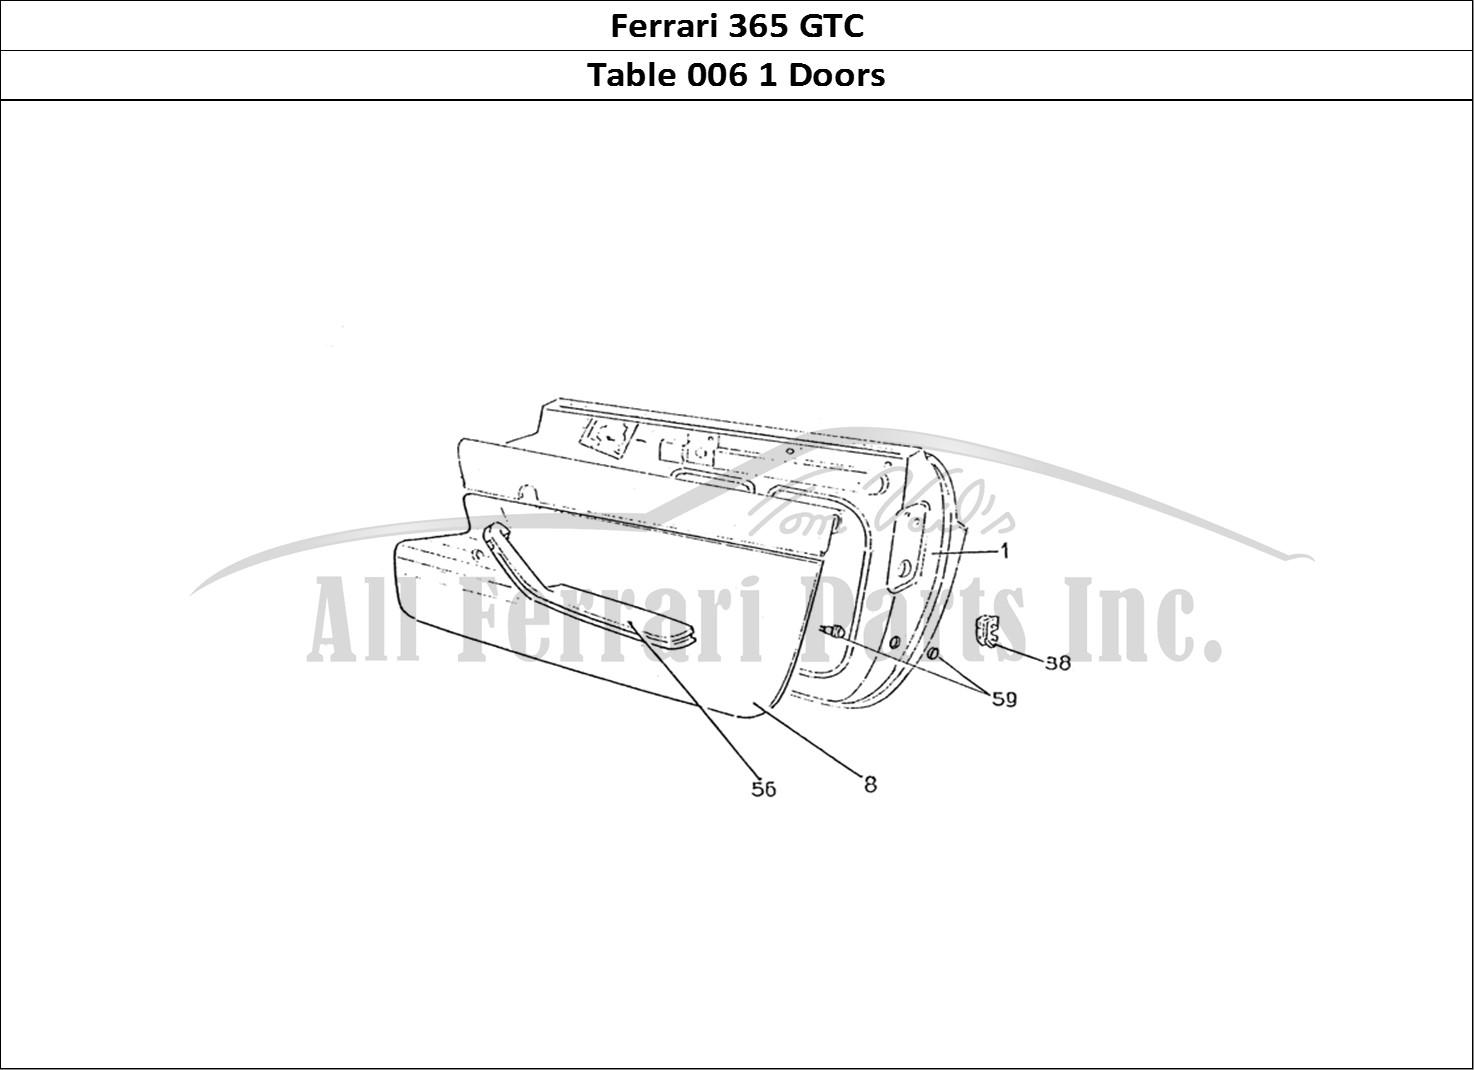 365 Gtc Wiring Diagram Library Leroy Somer Avr R448 Diagramchina Ferrari Bodywork Table 006 1 Doors